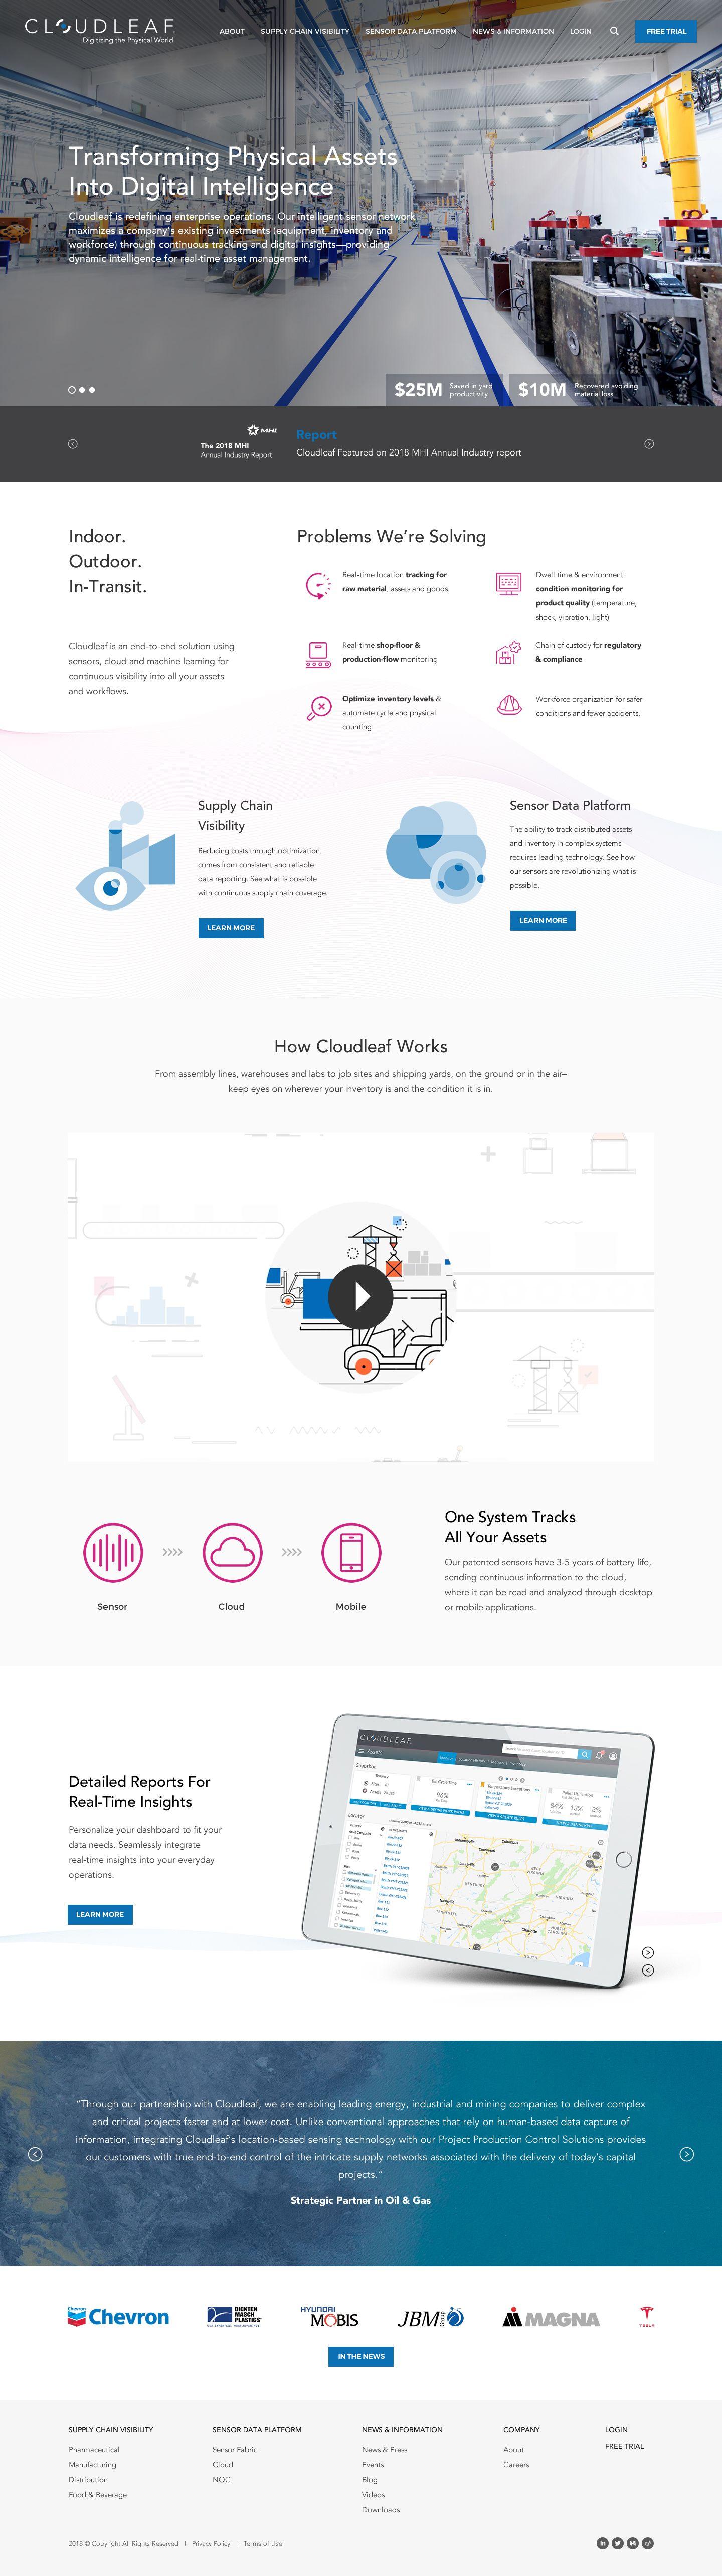 Cloudleaf Web Design Firm Web Development Web Design